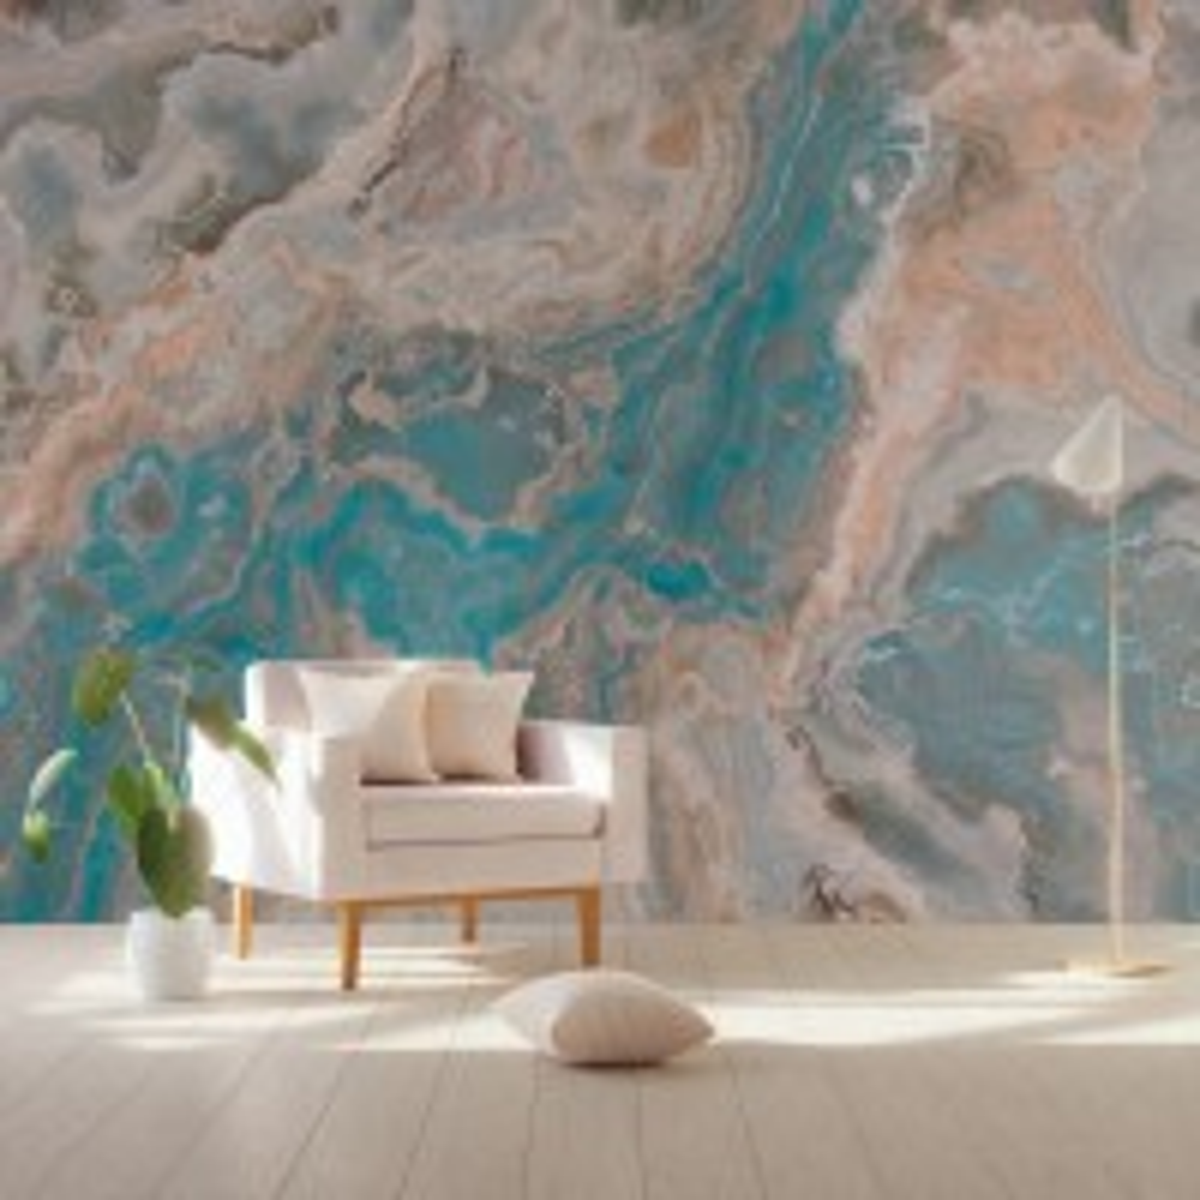 Turquoise Brown Wave Brush Wallpaper Mural